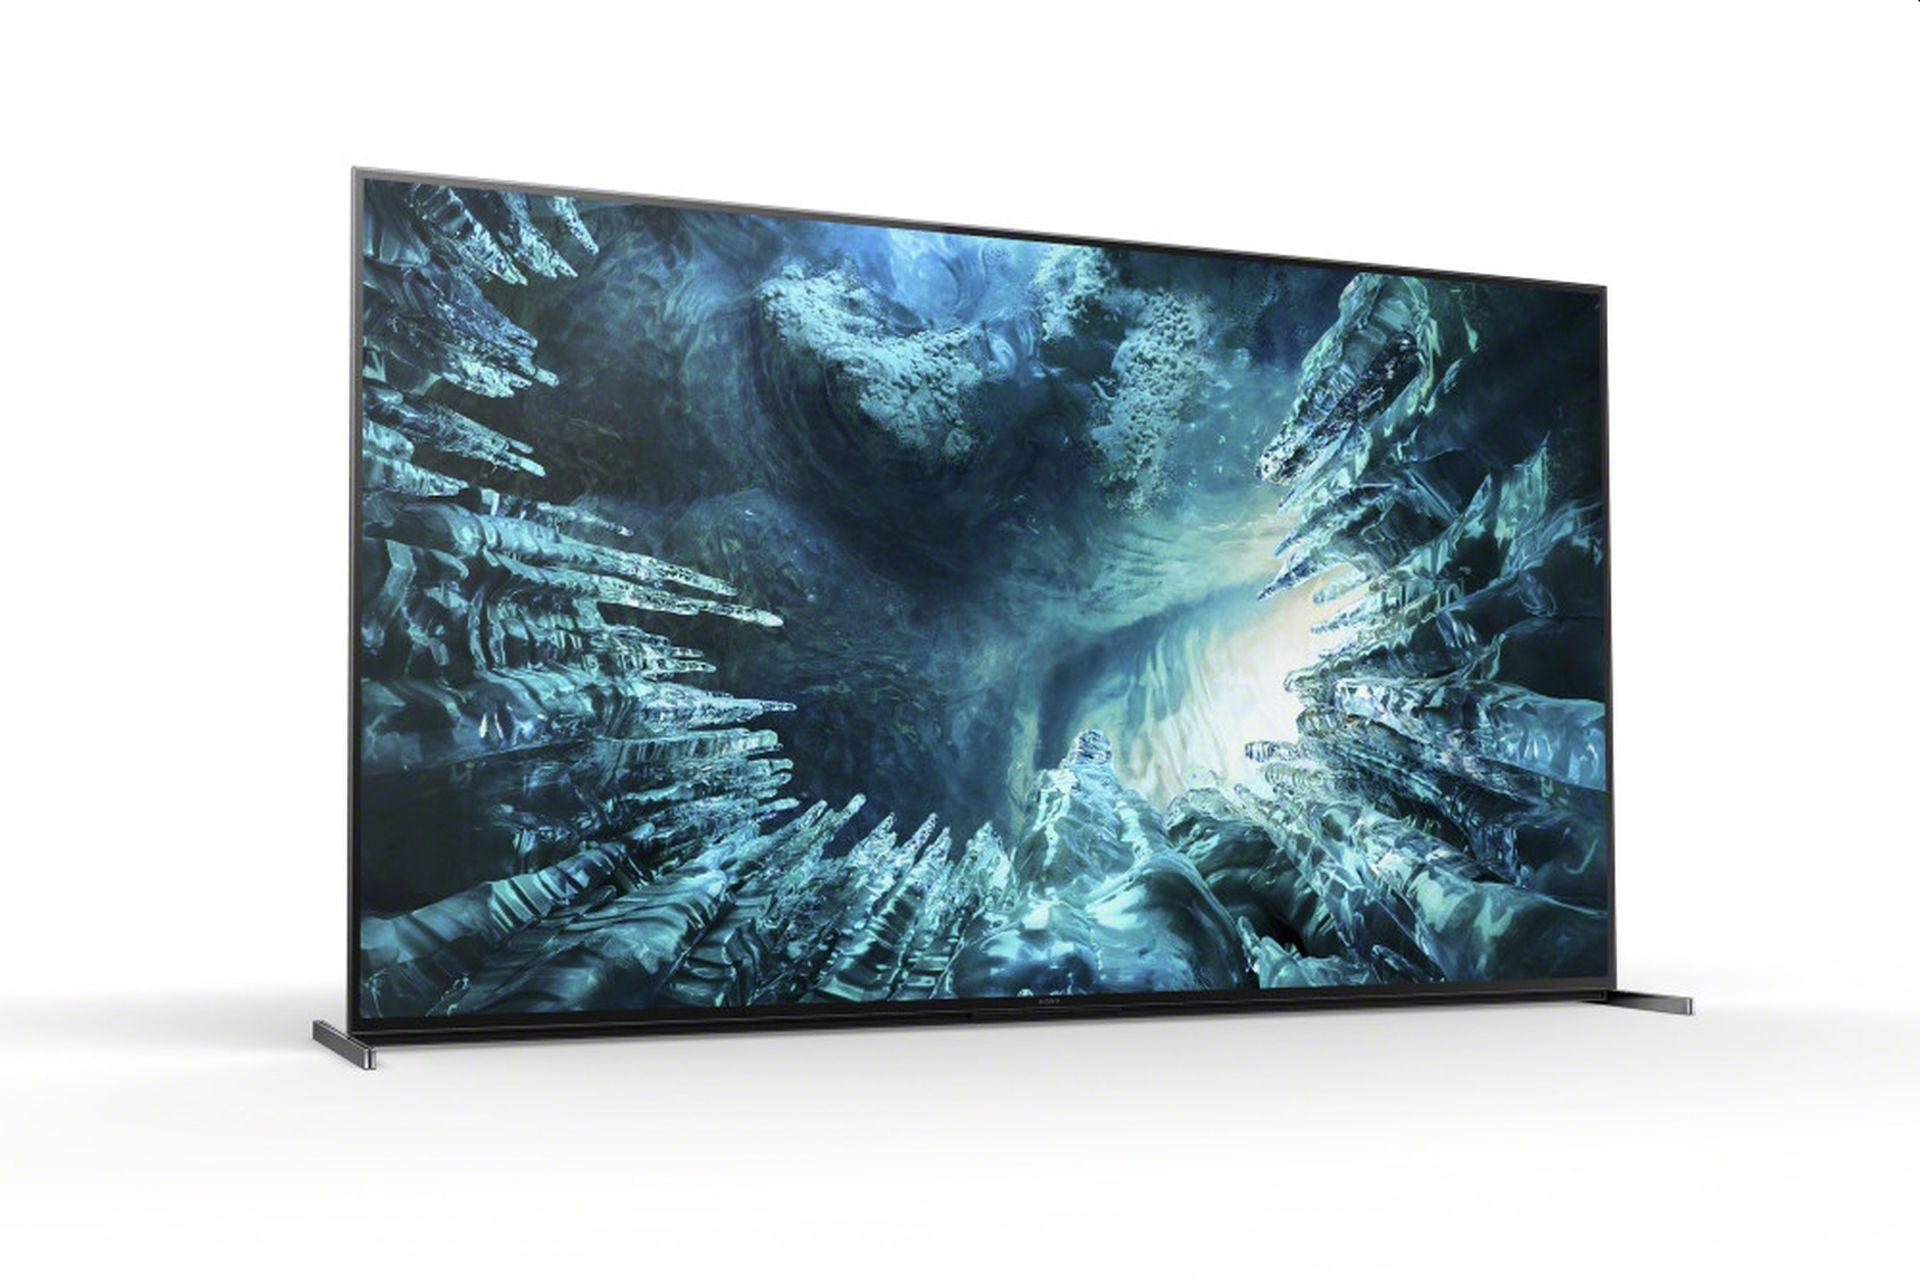 Telewizory Sony 8K, OLED i Full Aray LED 4K z HomeKit i AirPlay 2